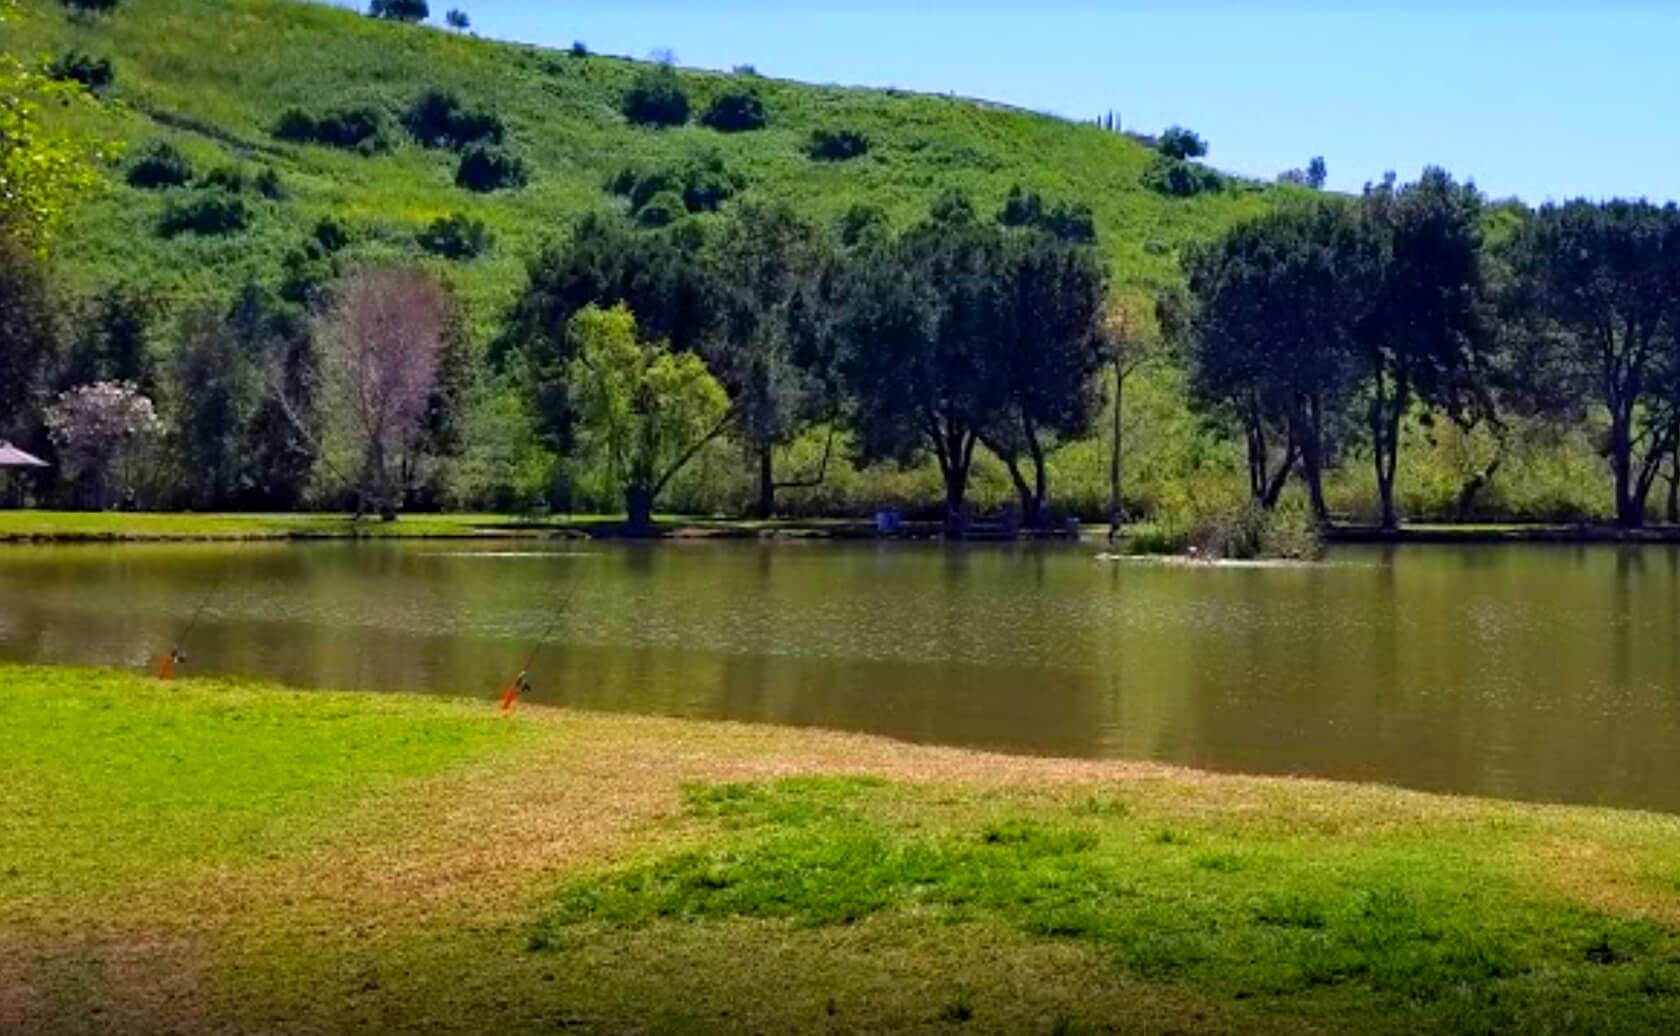 Carbon-Canyon-Park-Lake-Fishing-Guide-Report-Brea-CA-05